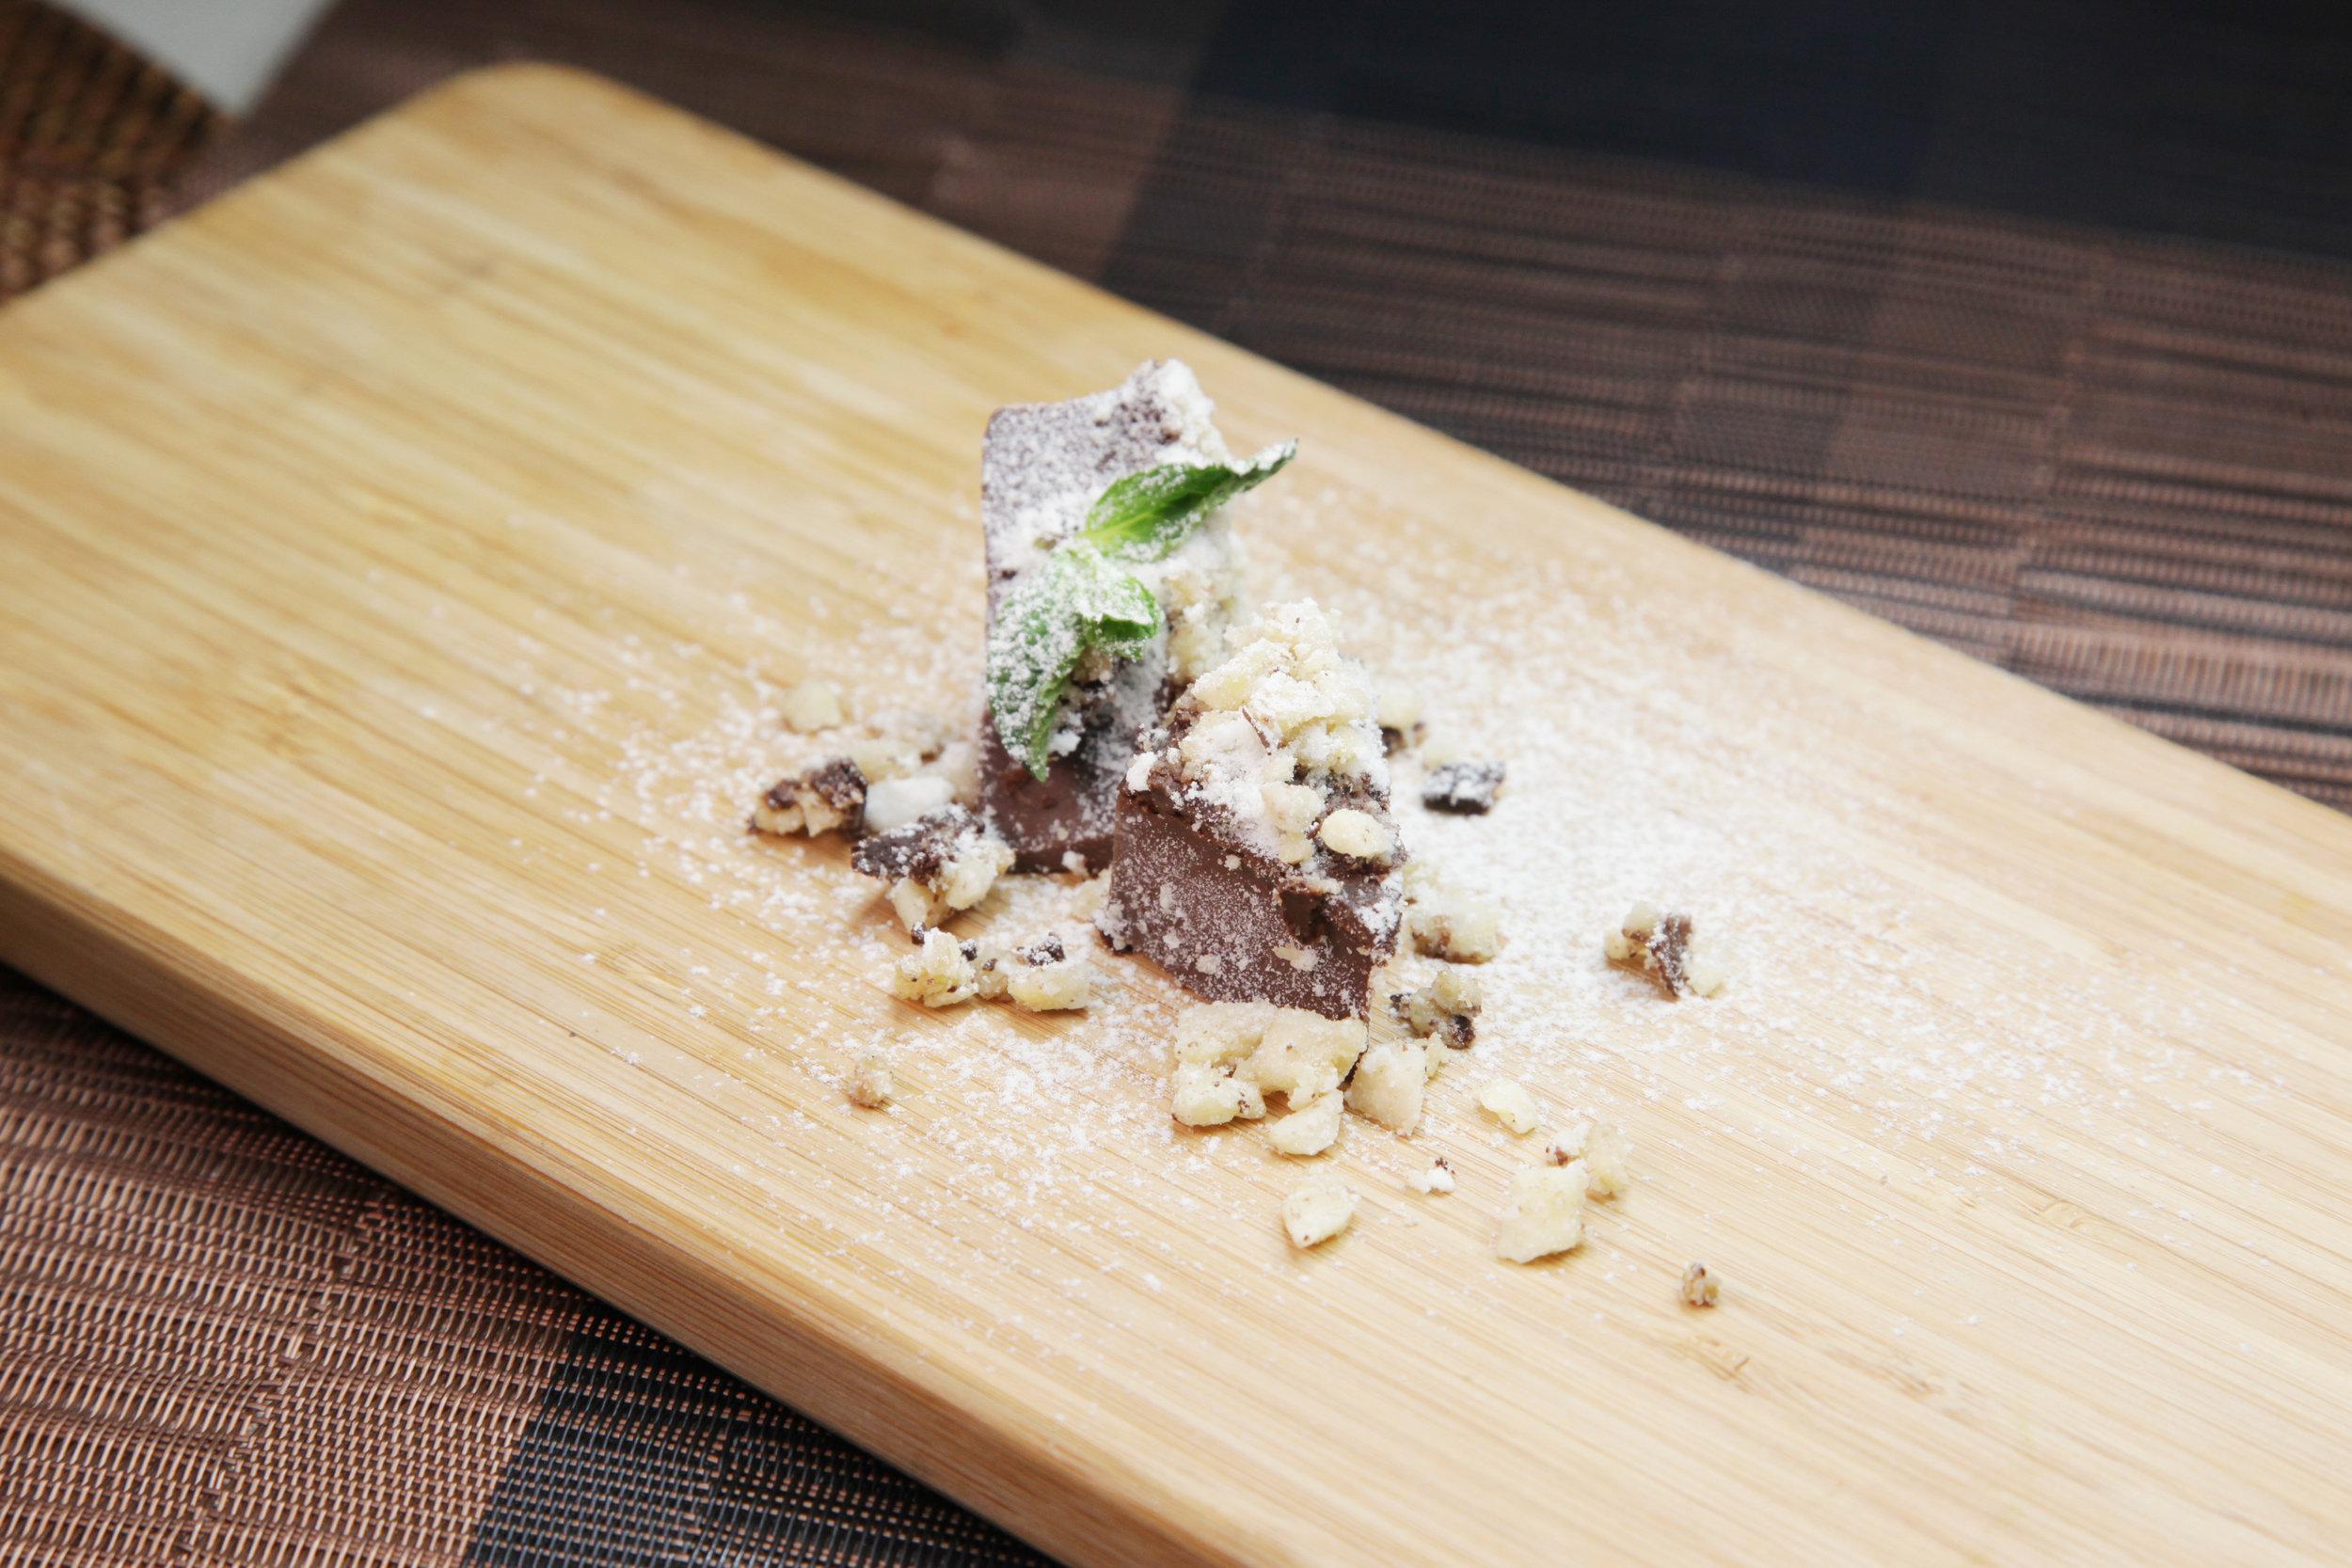 BANANA BROWNIE - 84 KCAL PER SERVINGBanana, Flour, Chocolate Chips, Egg, Milk, Butter, Cocoa Powder, Vanilla Extract, Salt$18